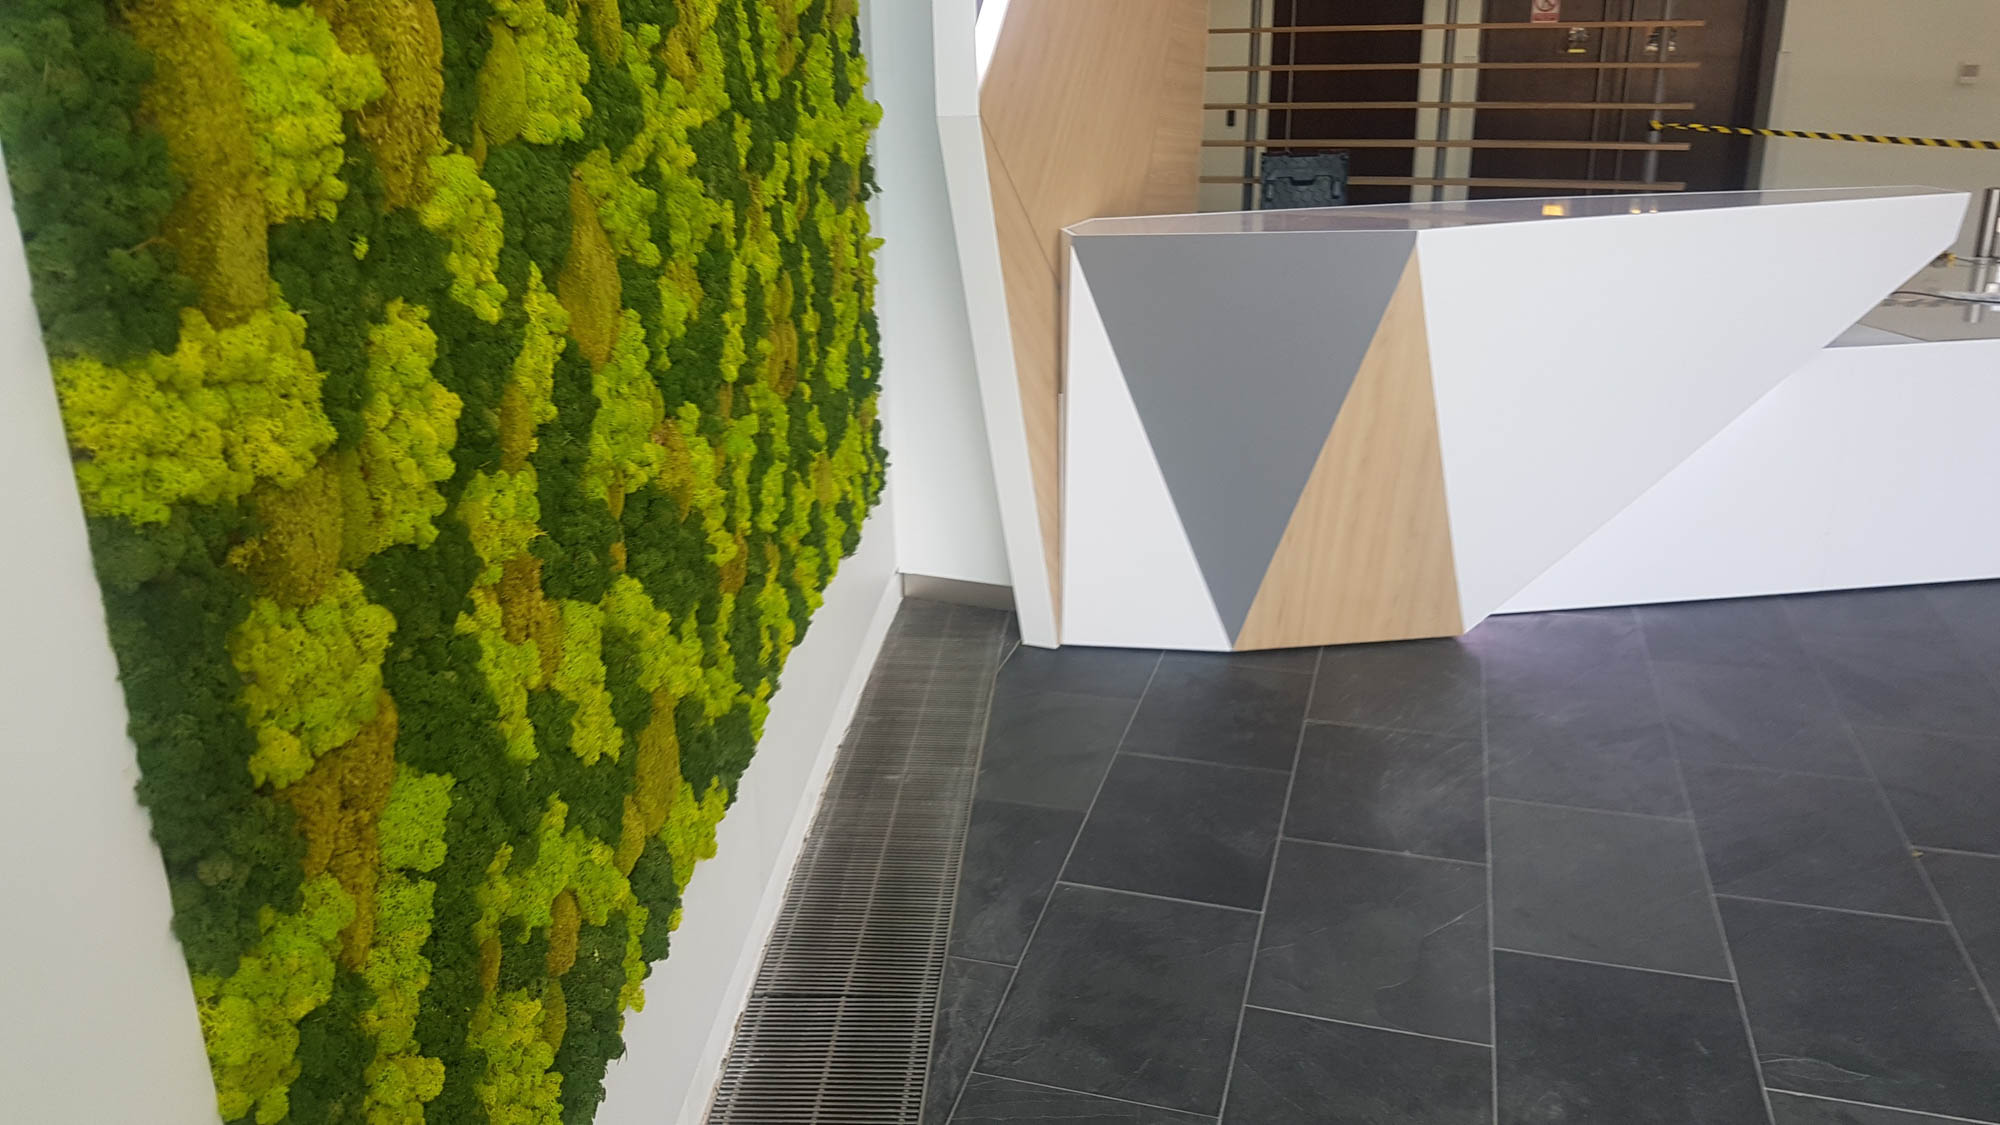 utilita-mosswall-bespoke-custom-plantcare-bristol-image-4